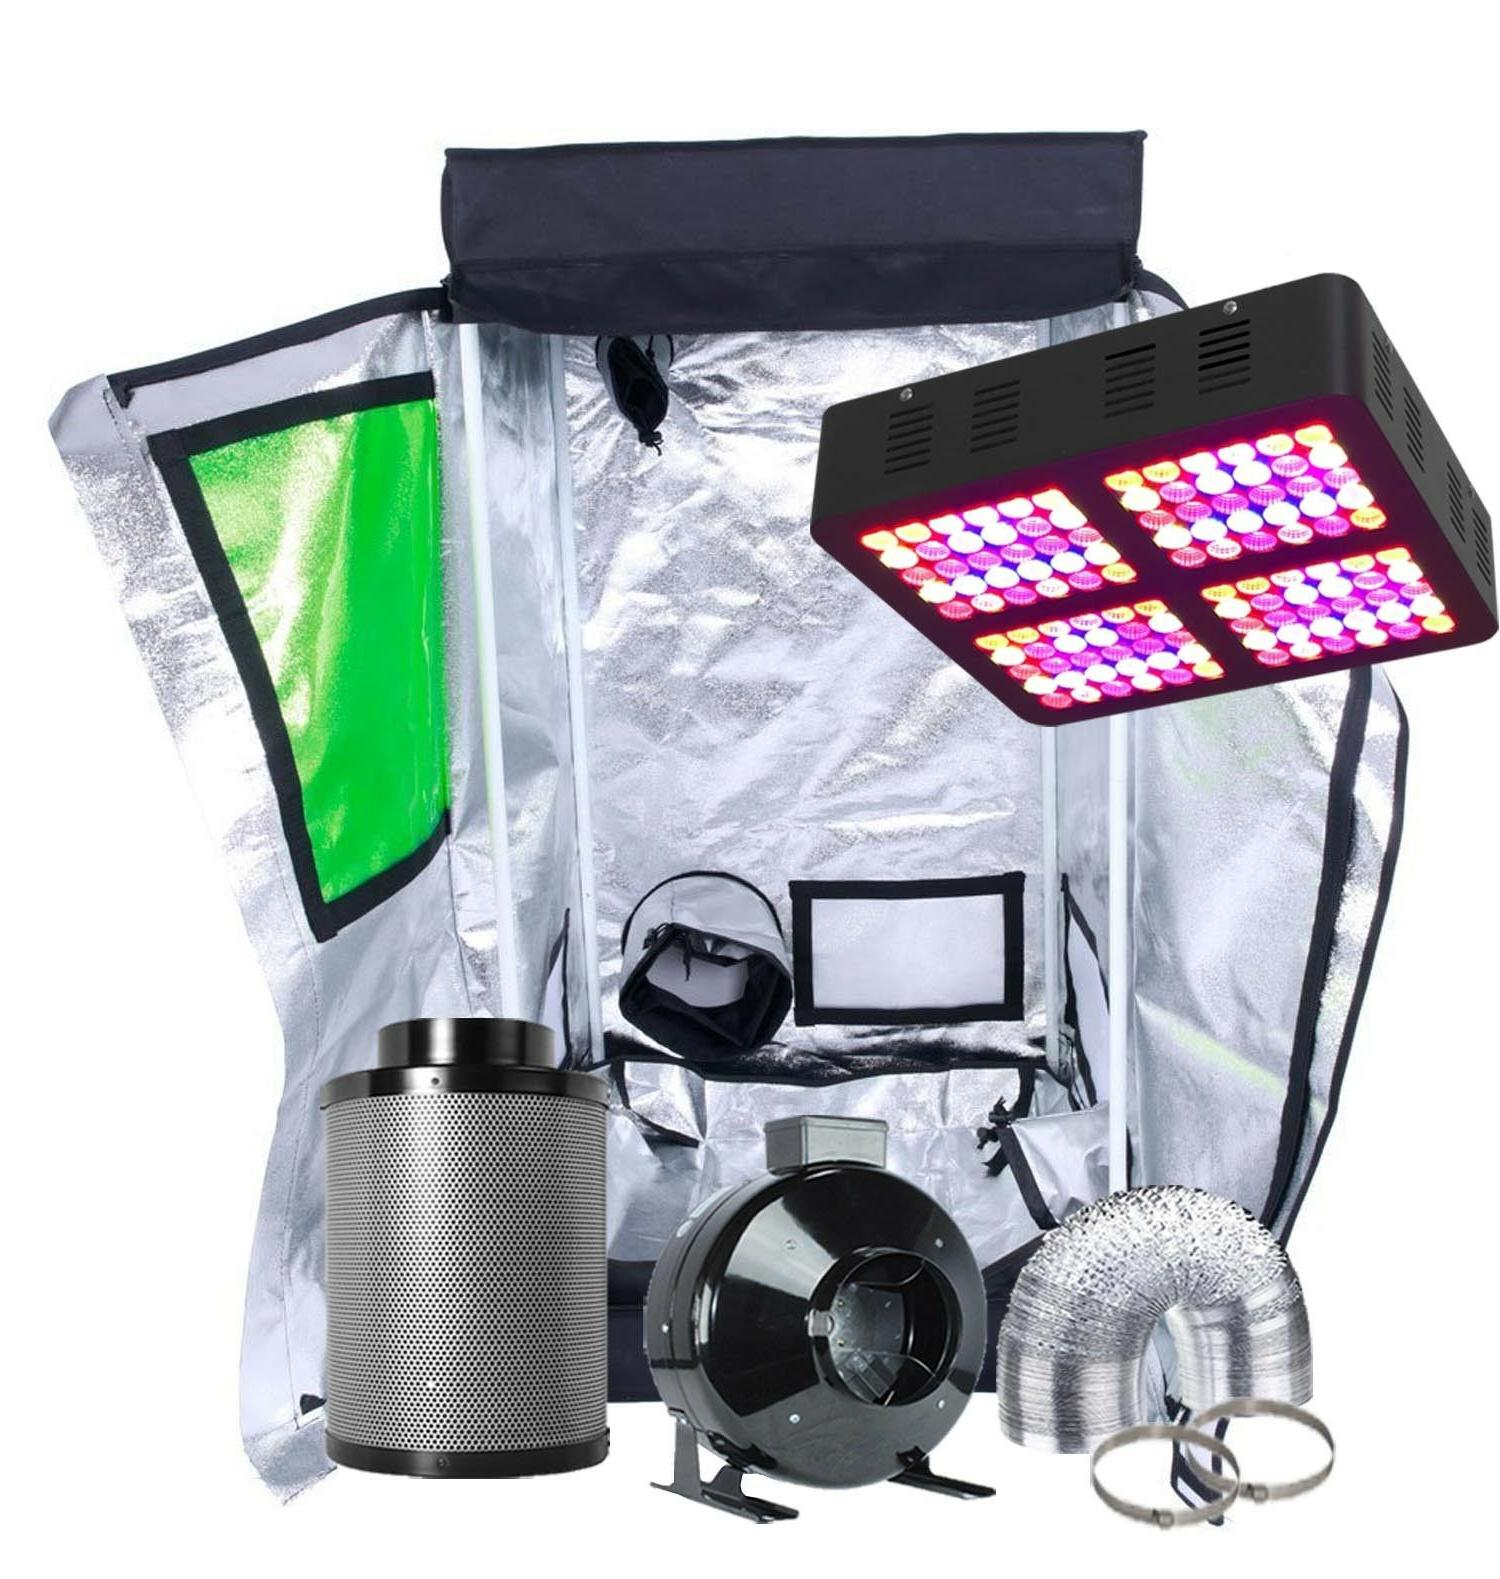 TopoGrow Light Kit Indoor Grow